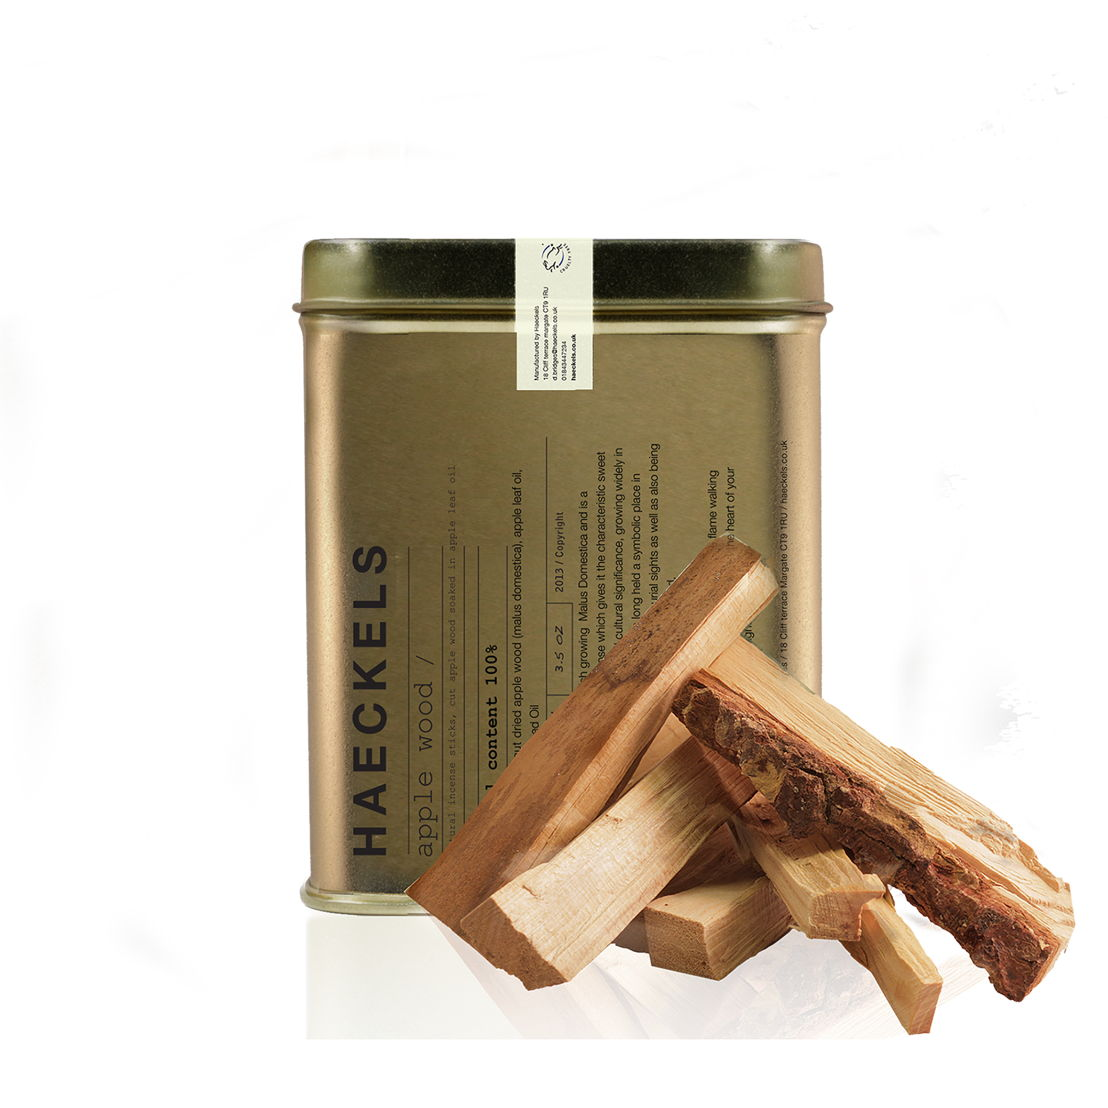 Apple Wood / Raw Incense - €24